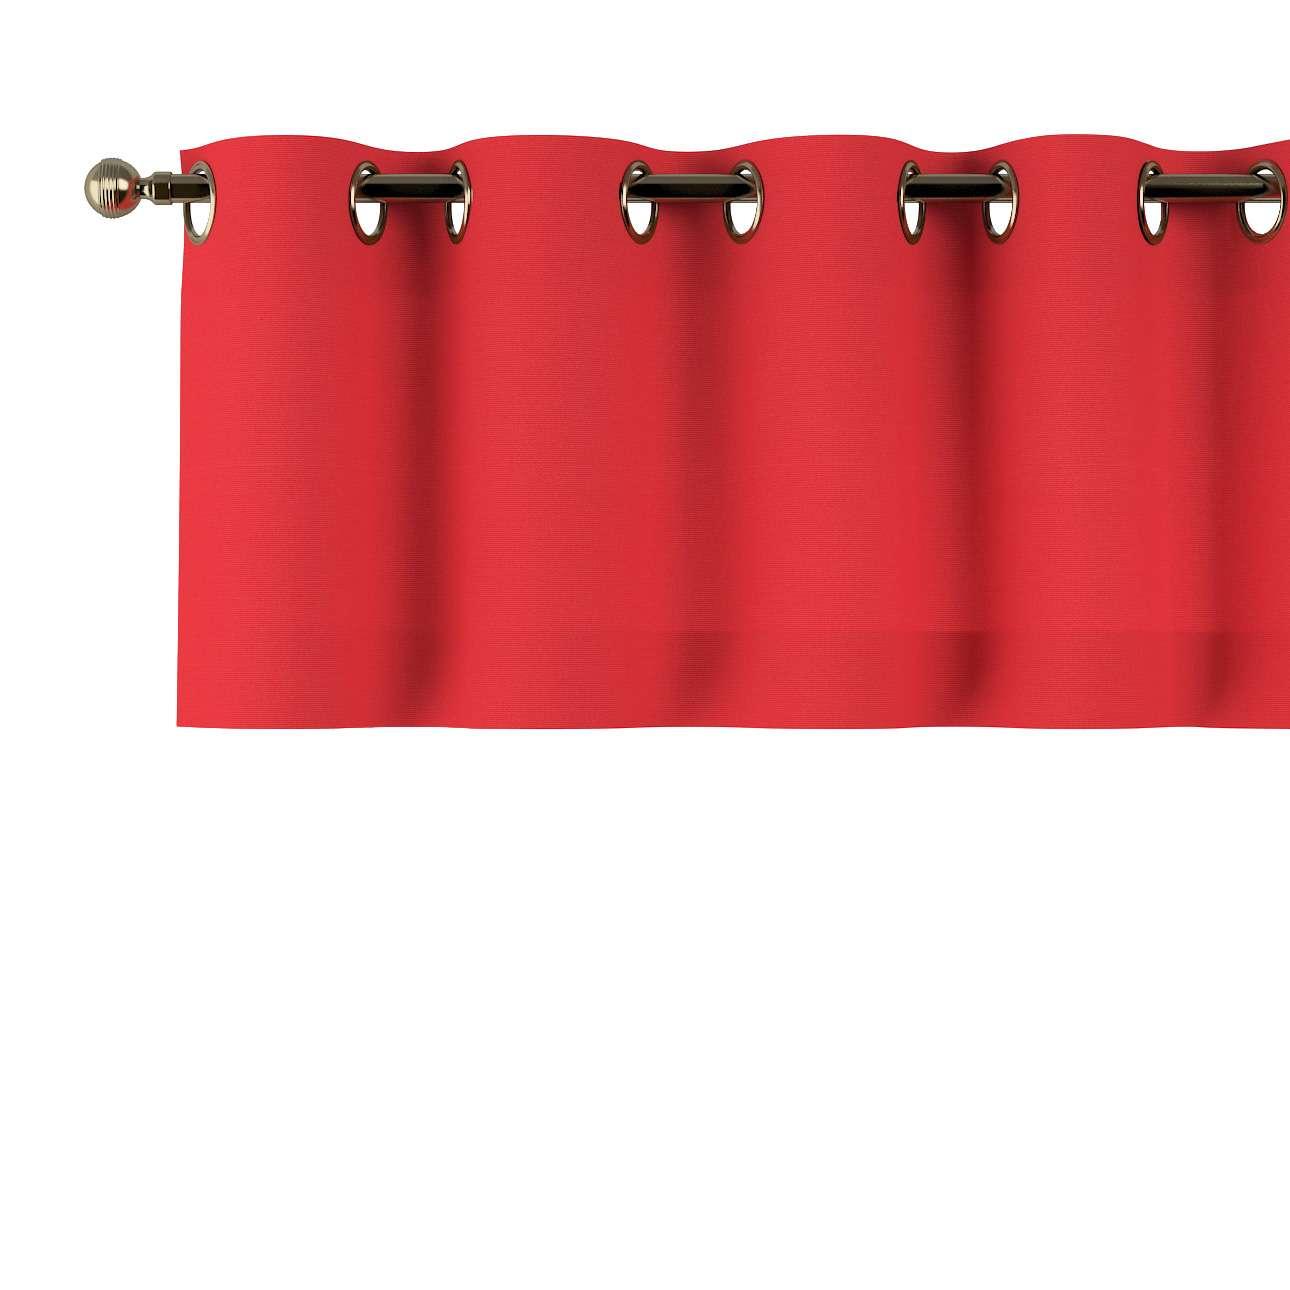 Lambrekin na kroužcích  130x40cm v kolekci Loneta, látka: 133-43